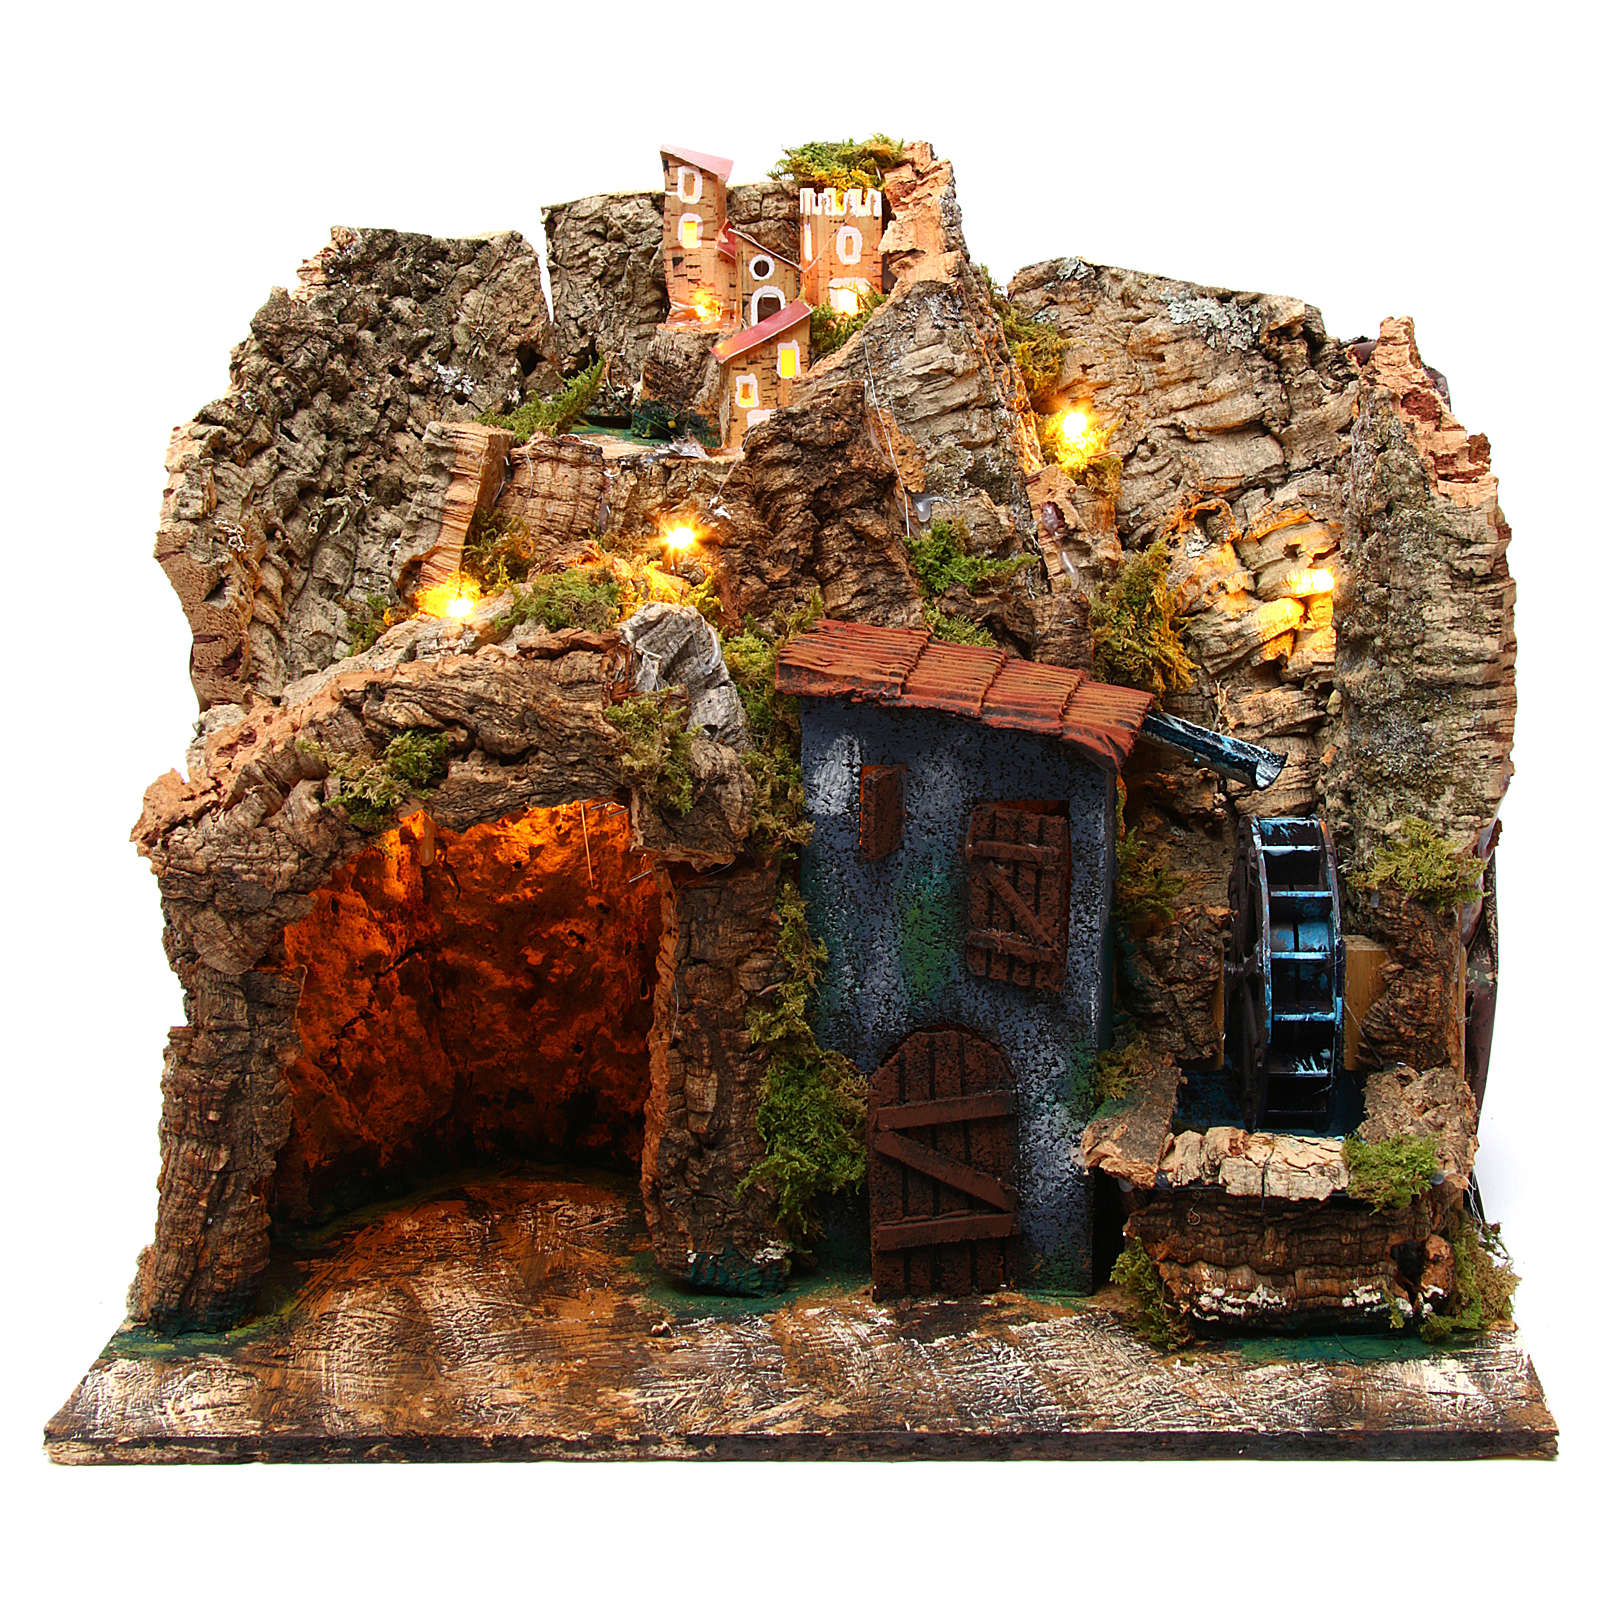 Aldea belén napolitano con molino de agua 45x30x40 cm para 6-8 cm de altura media 4